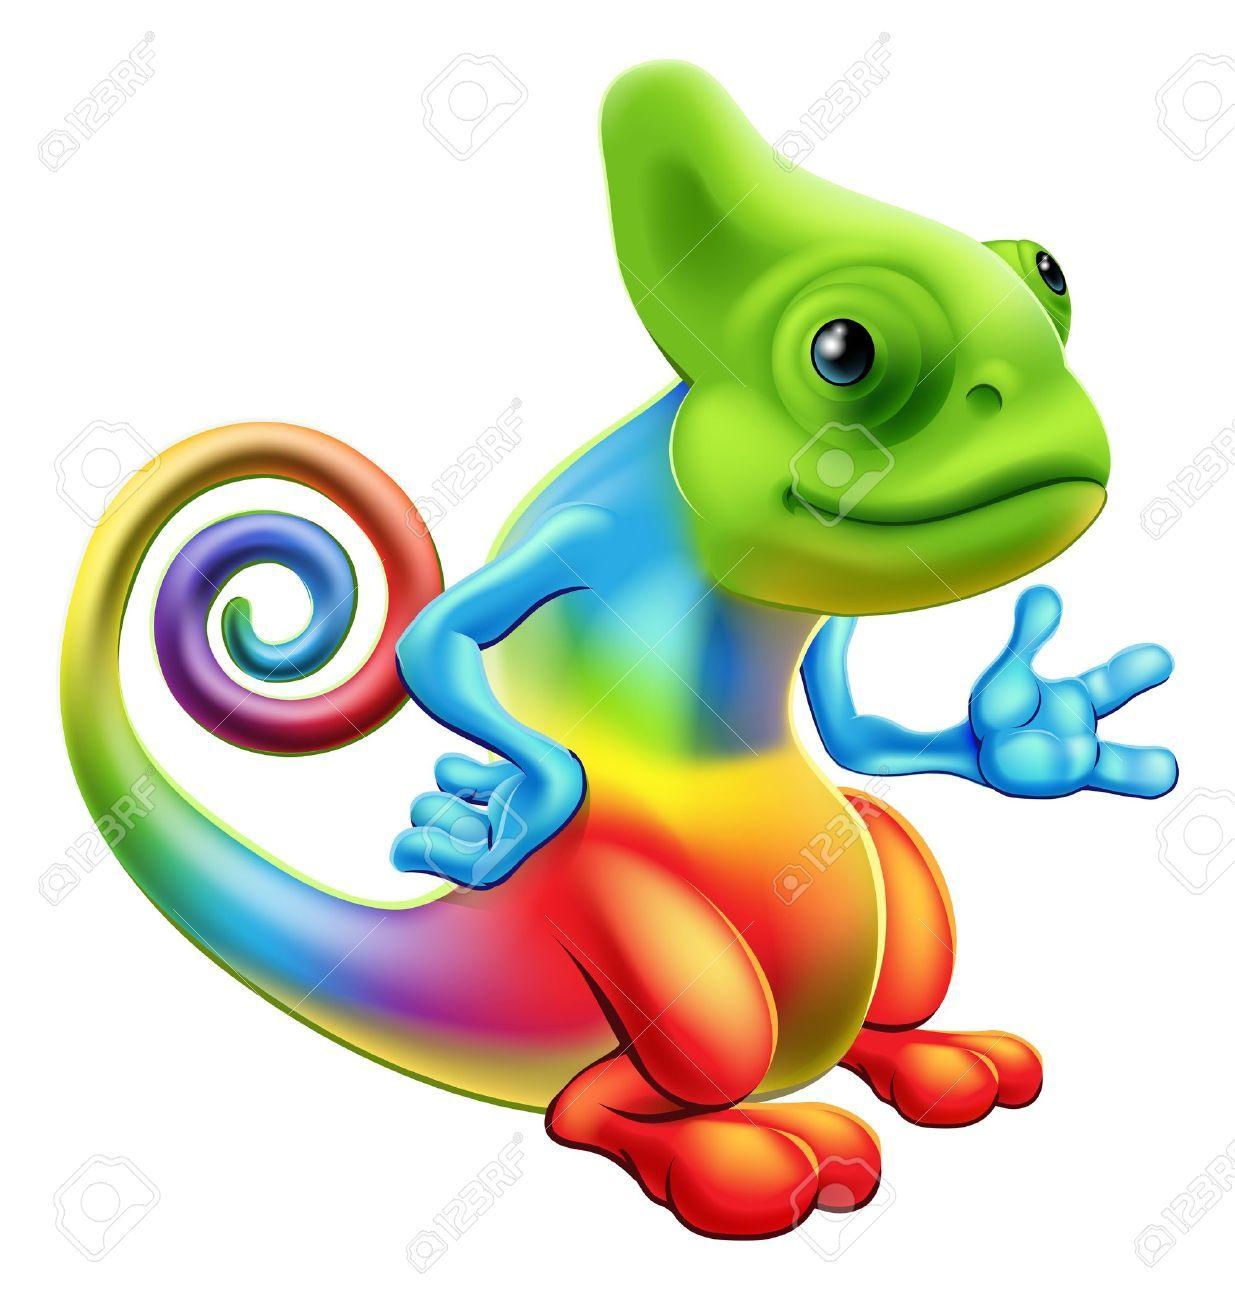 Chameleon clipart free 5 » Clipart Portal.